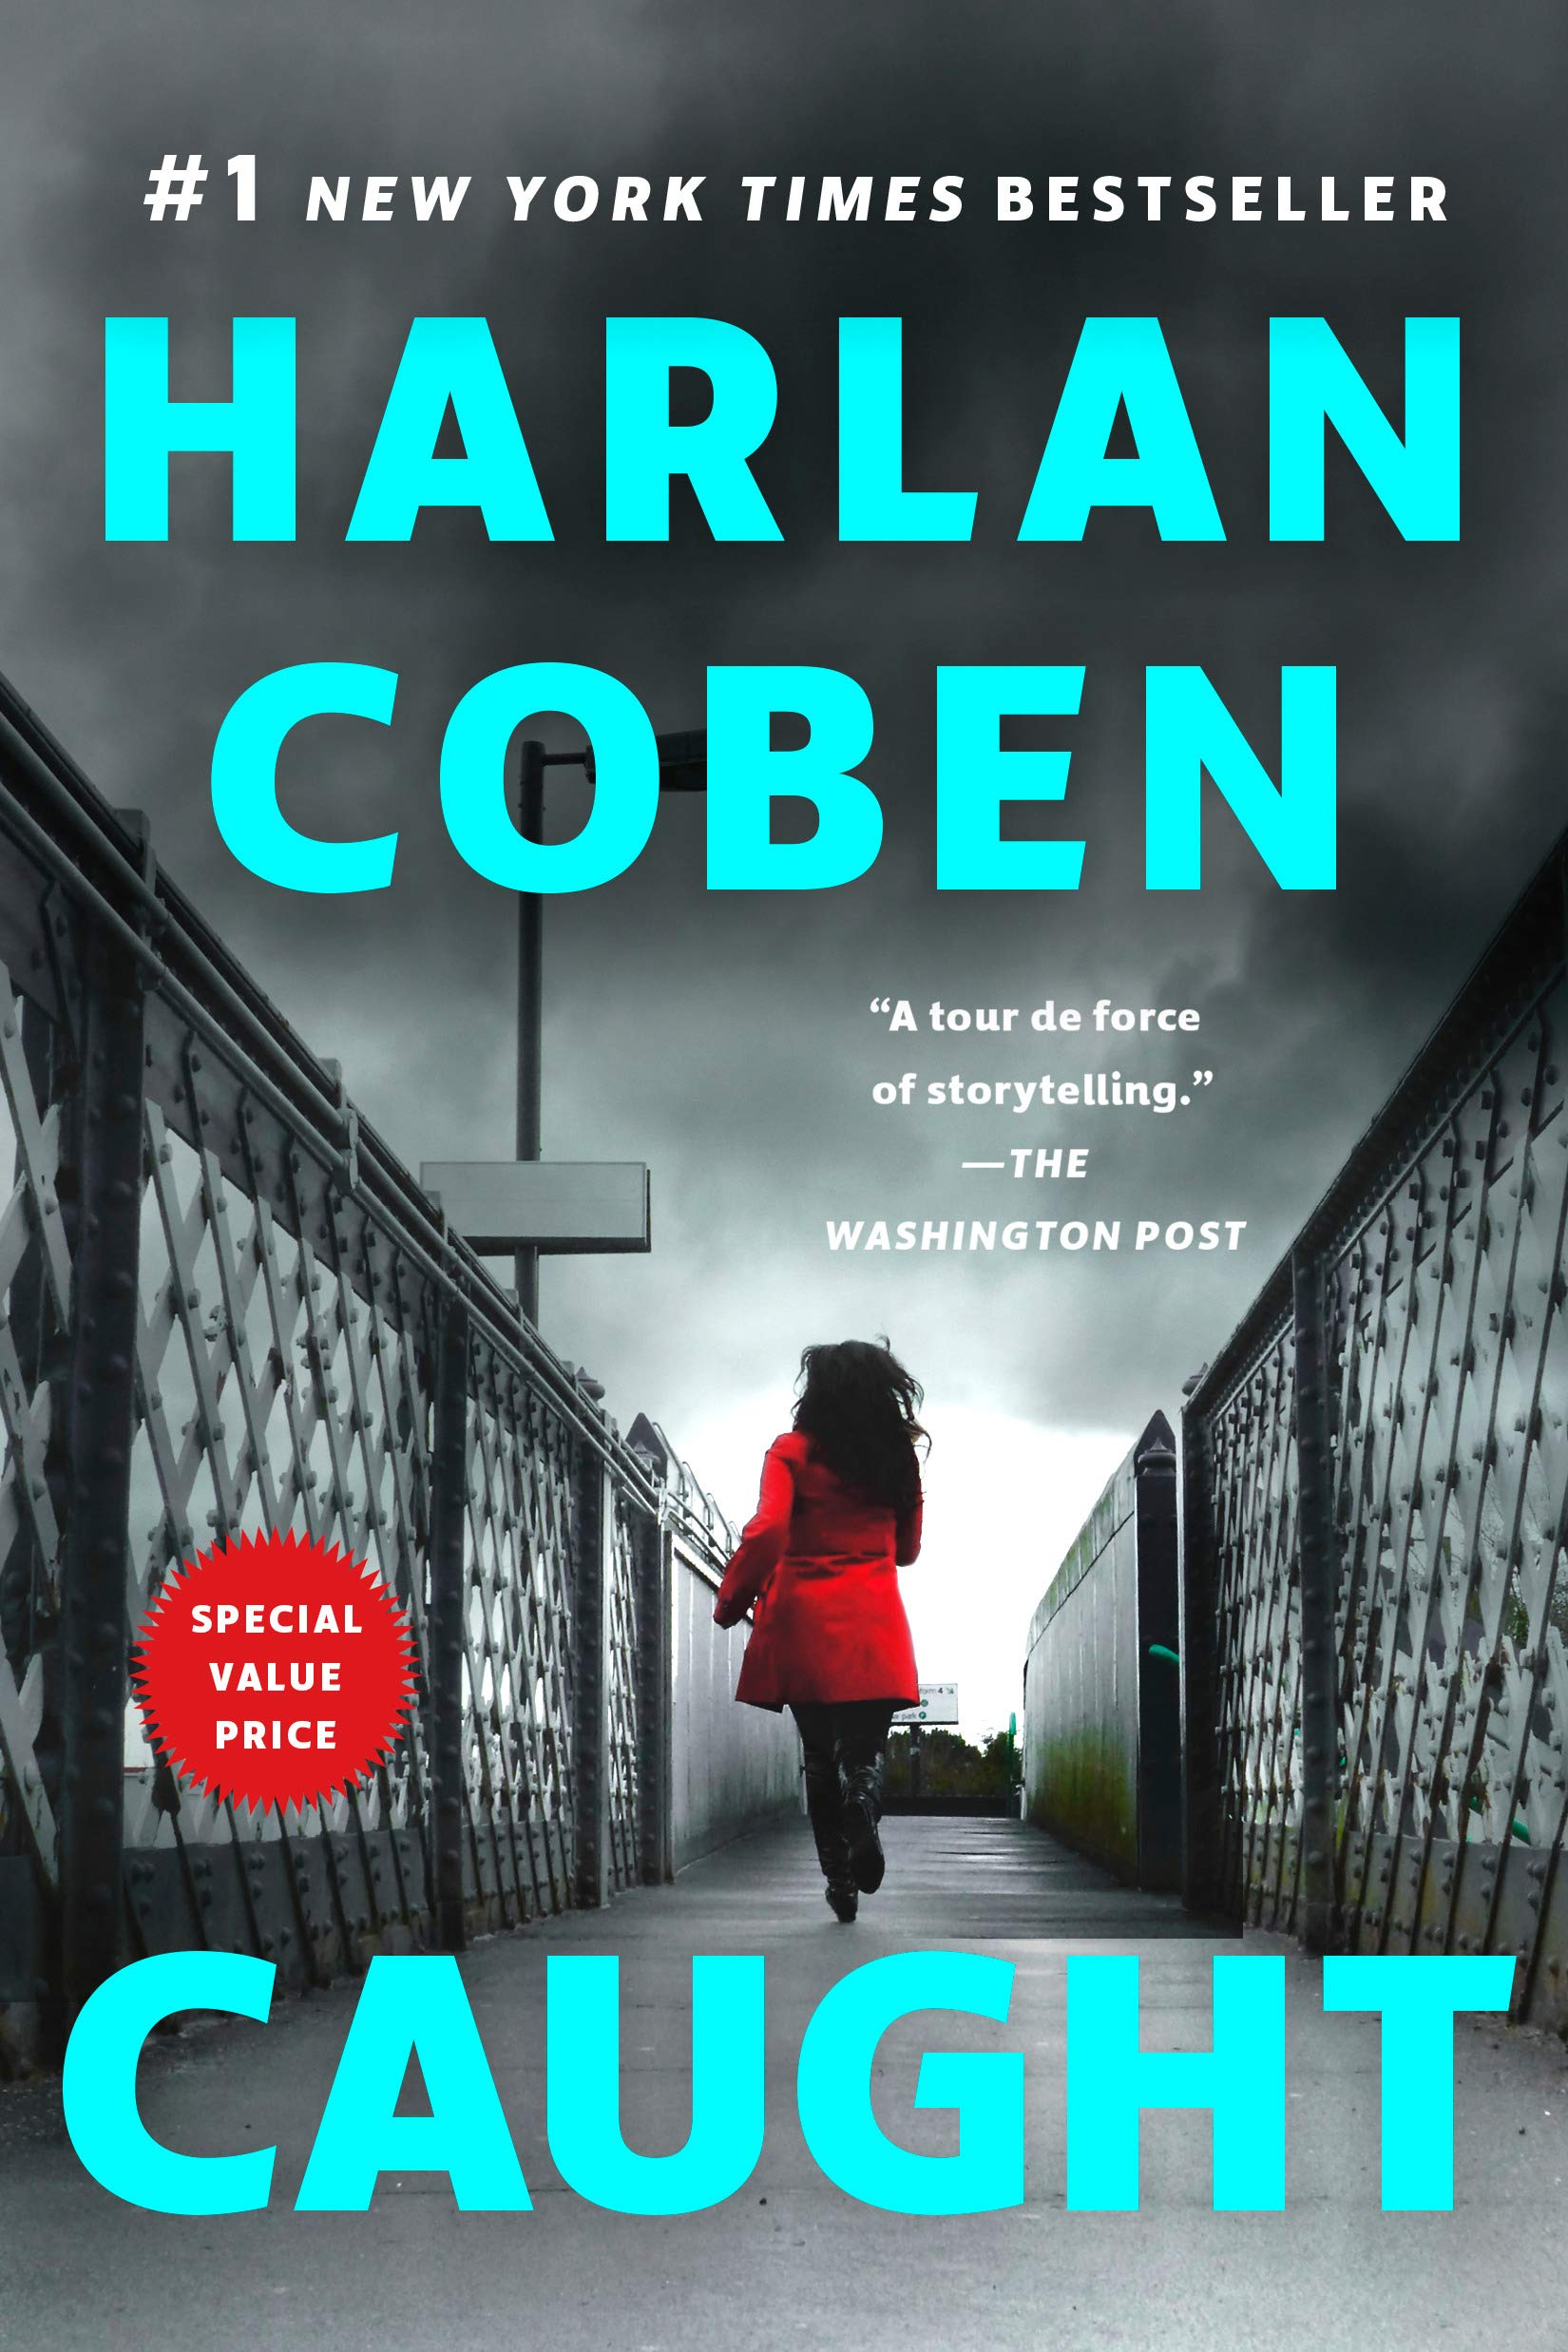 Caught Harlan Coben